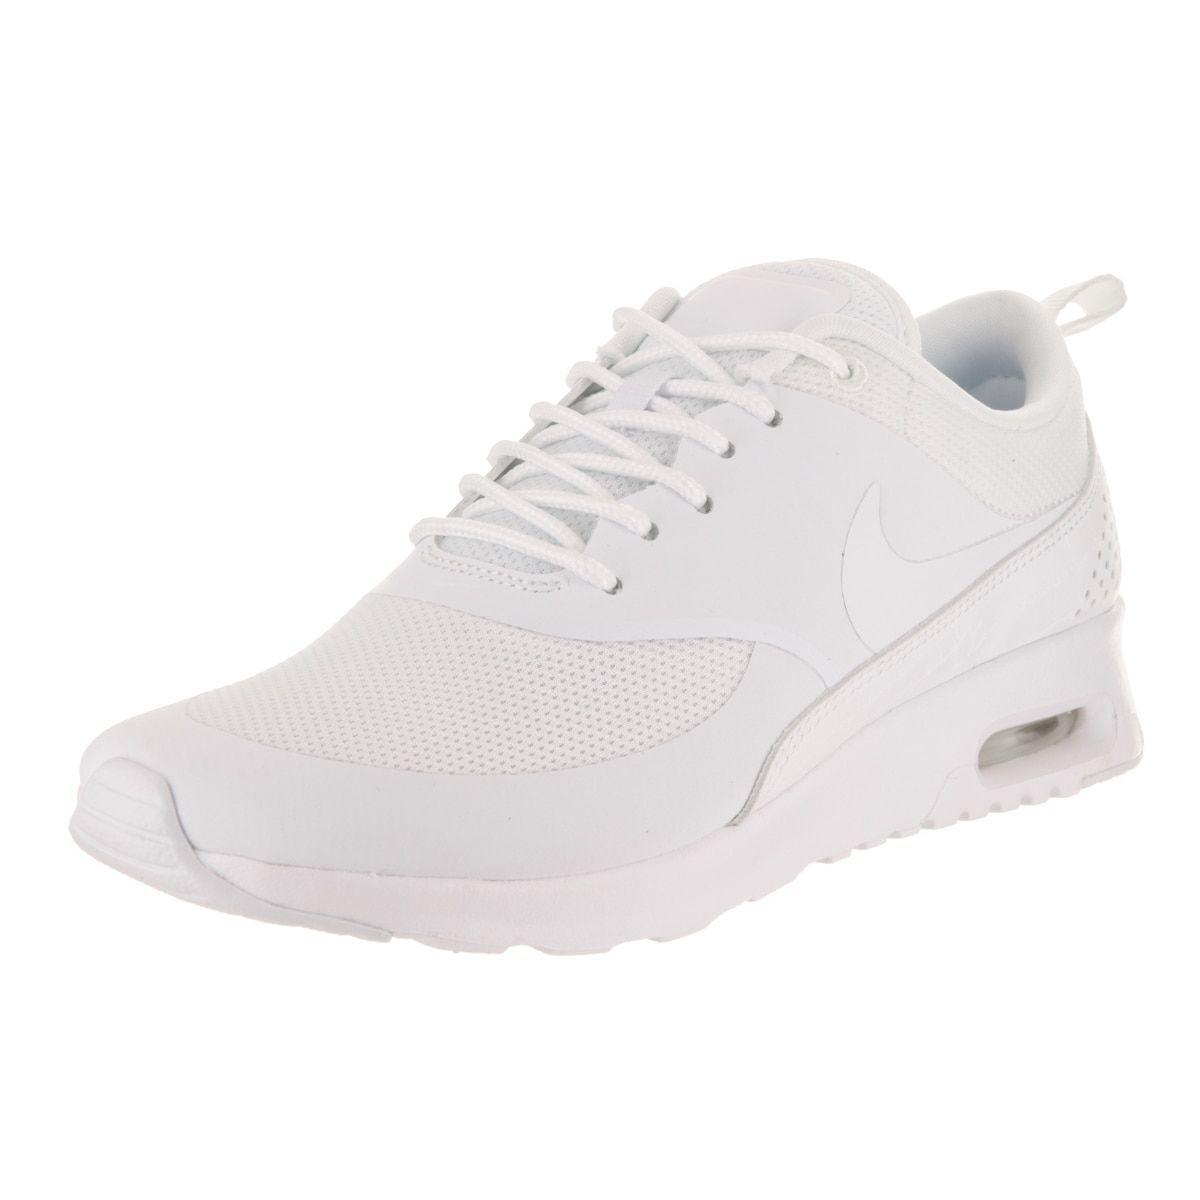 5853e9df31f2 Nike Women s Air Max Thea White Textile Running Shoe (10)